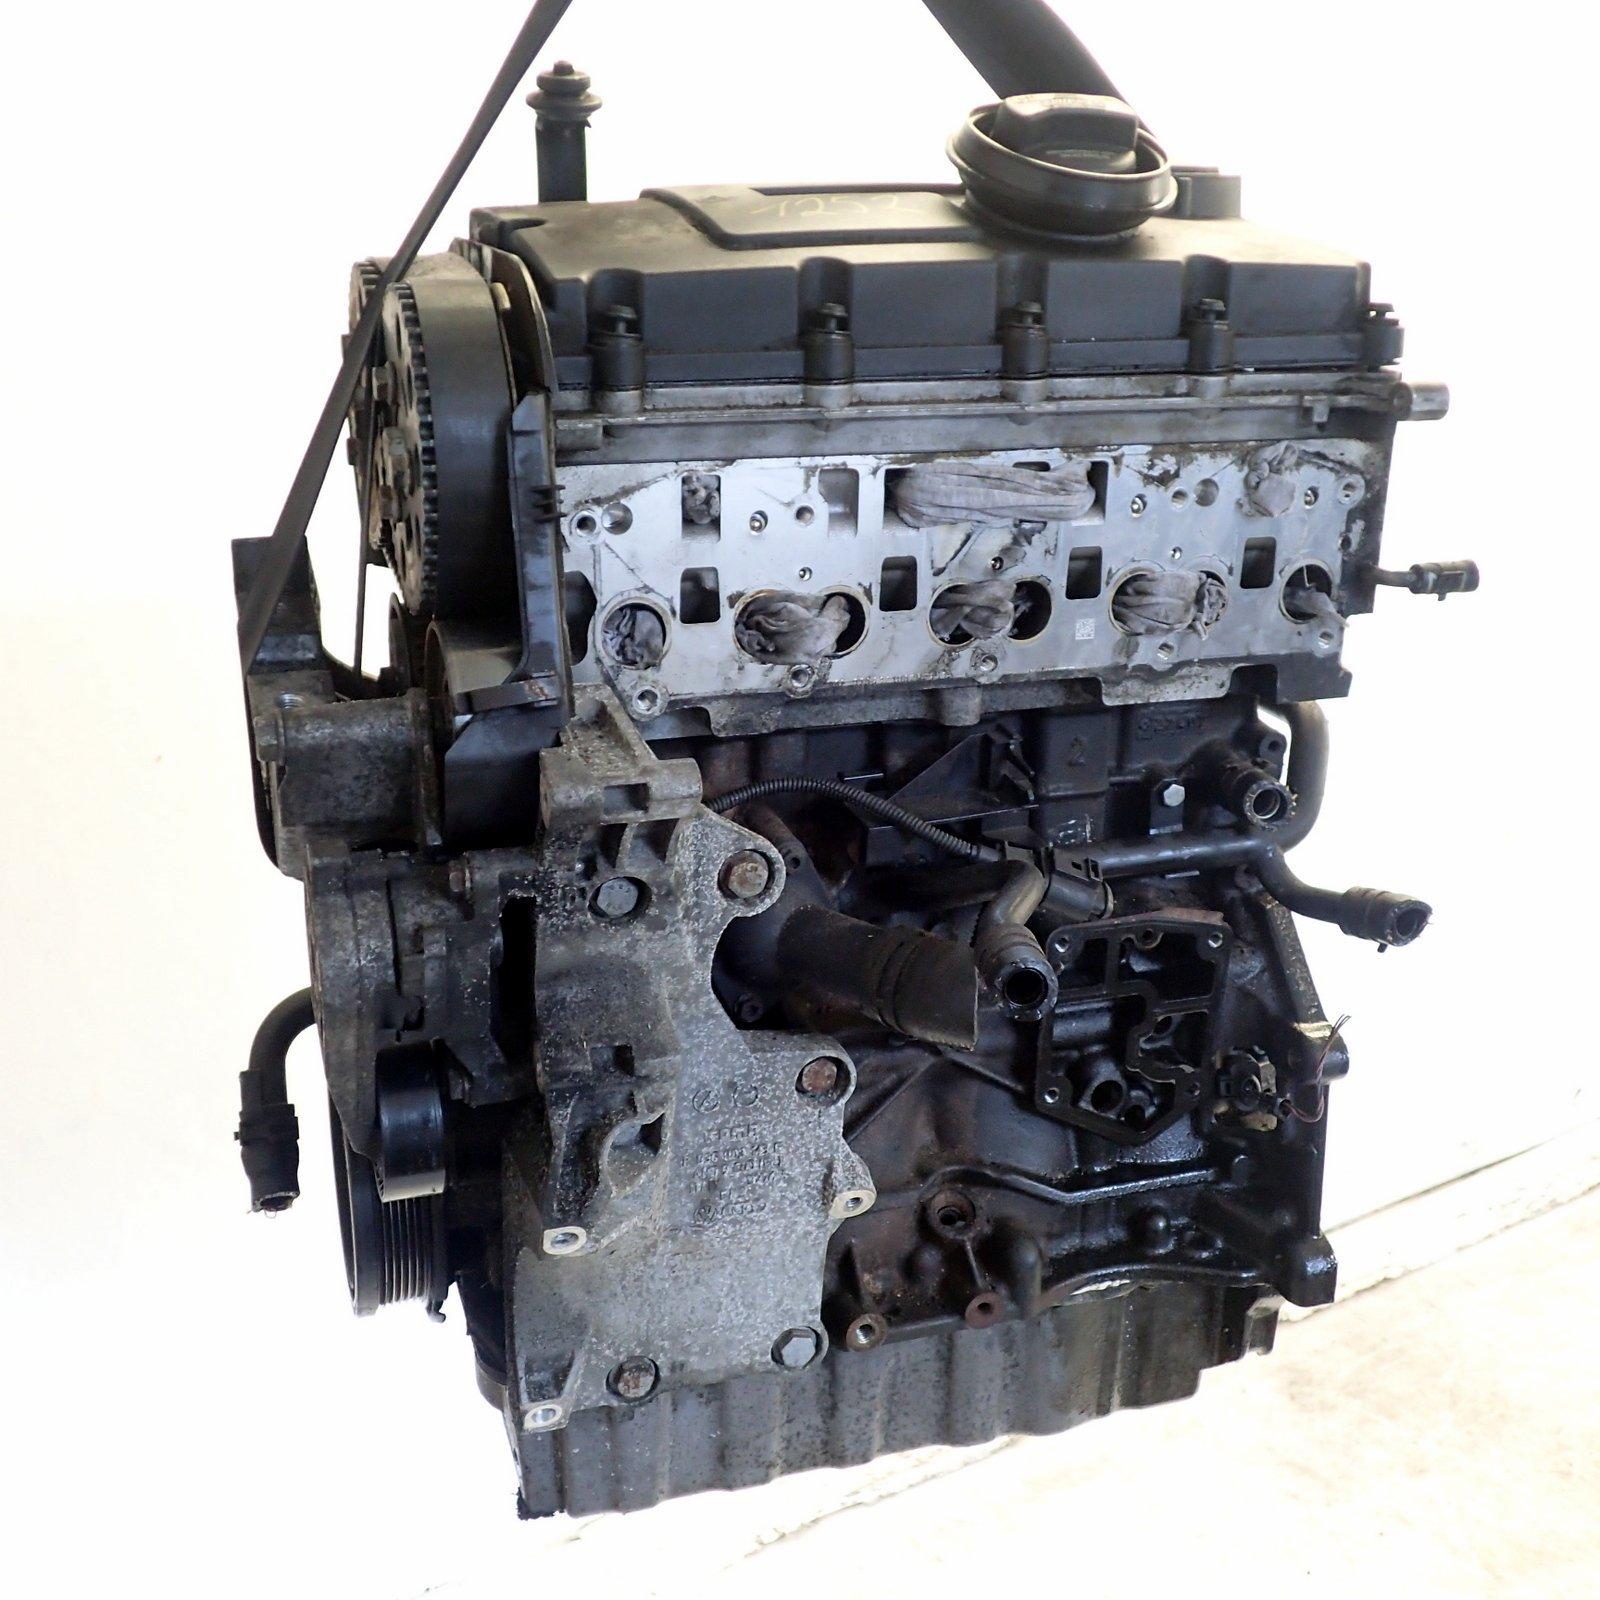 Engine-Bare-BKD-Ref-1252-VW-Touran-mk1-2-0-Tdi